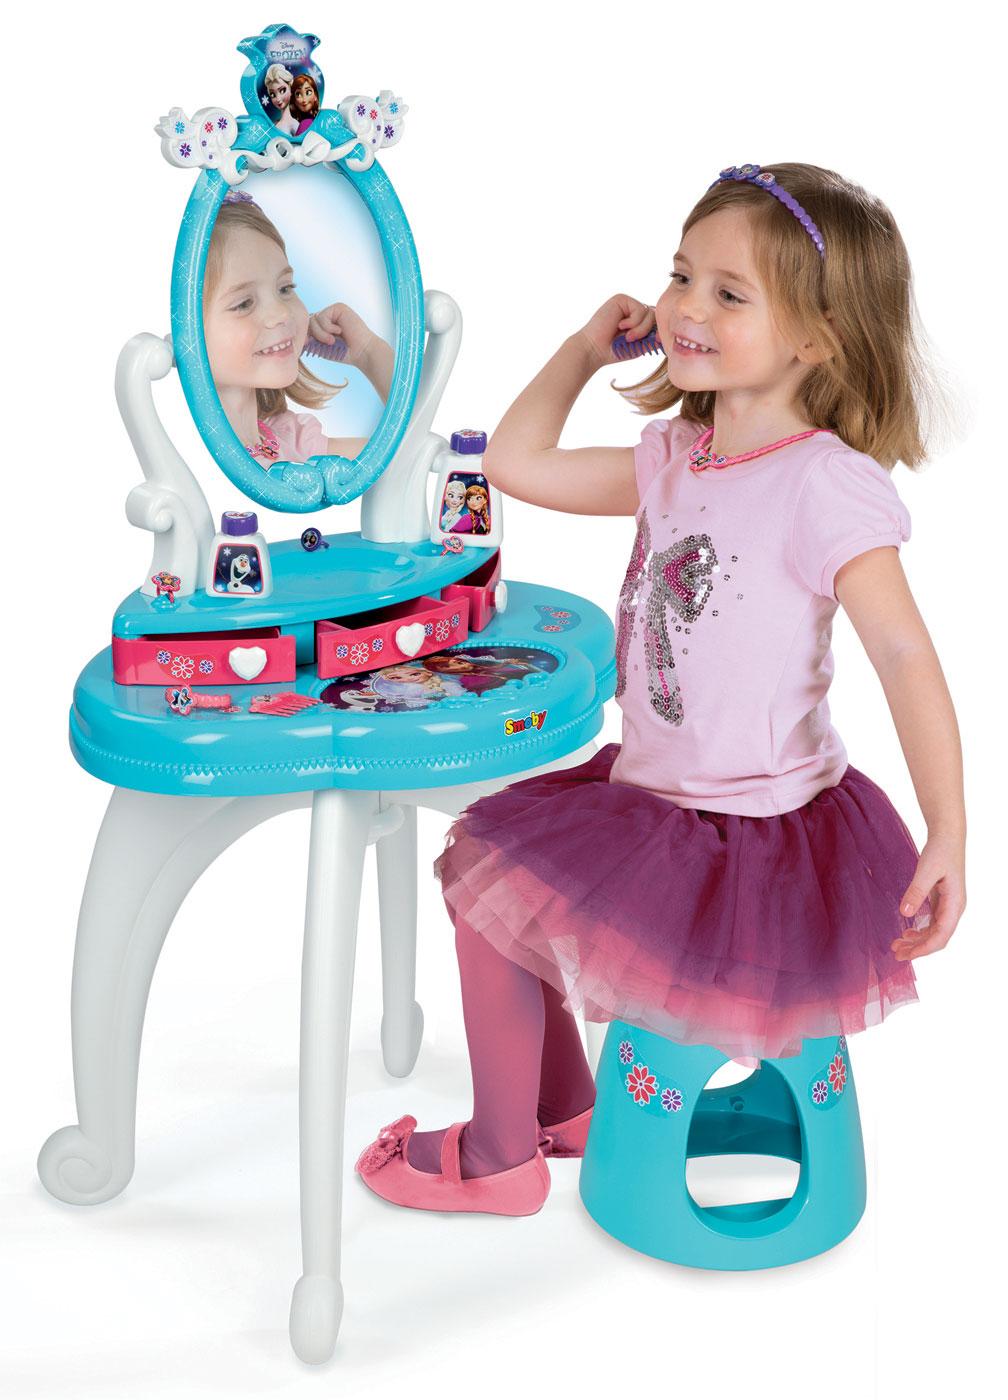 Detský kozmetický stolík Disney Frozen Smoby 2v1 so stoličkou a 10 doplnkami 320214 akvamarínový